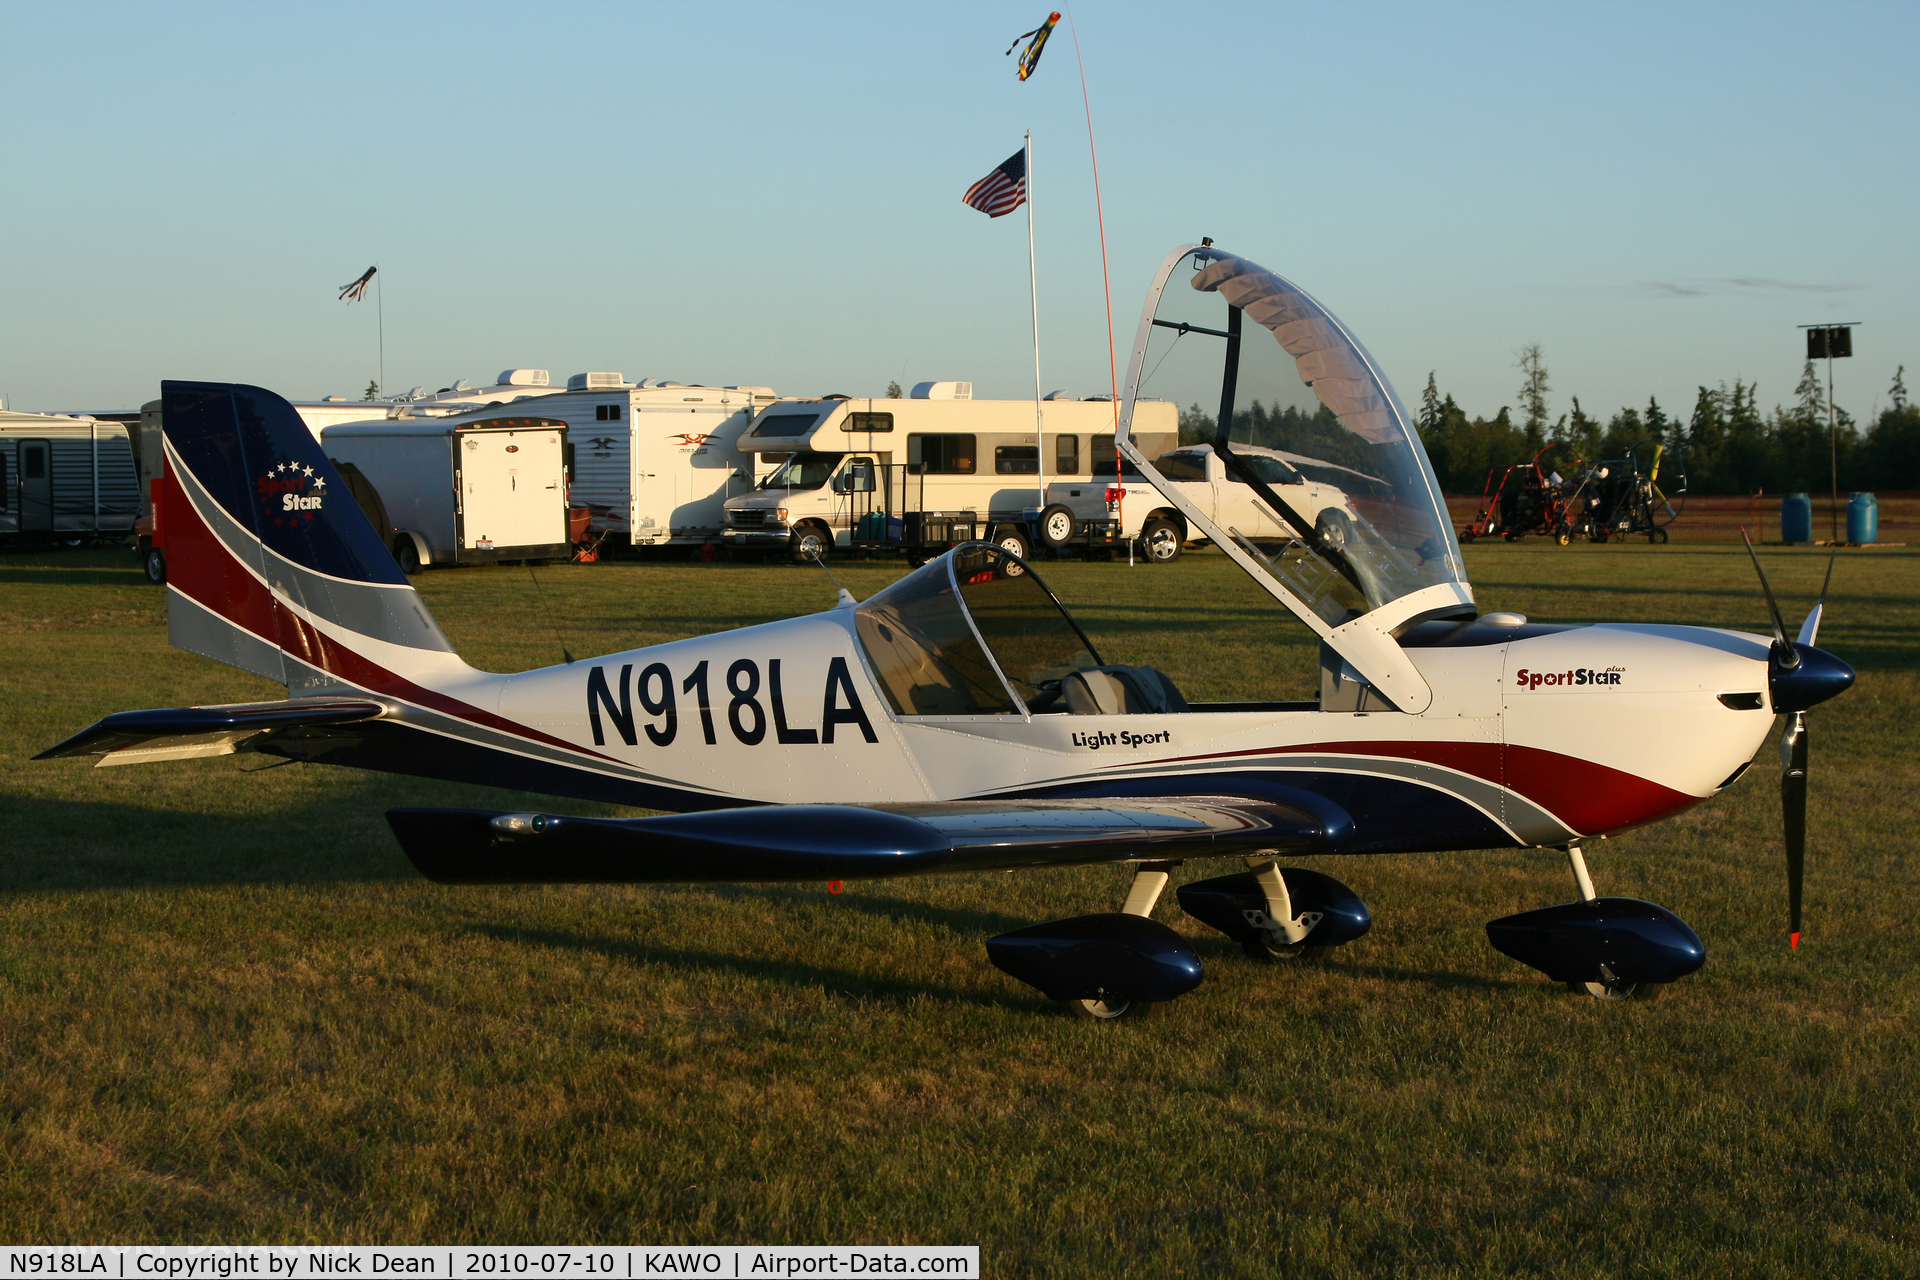 N918LA, 2007 Evektor-Aerotechnik SPORTSTAR PLUS C/N 20070918, KAWO